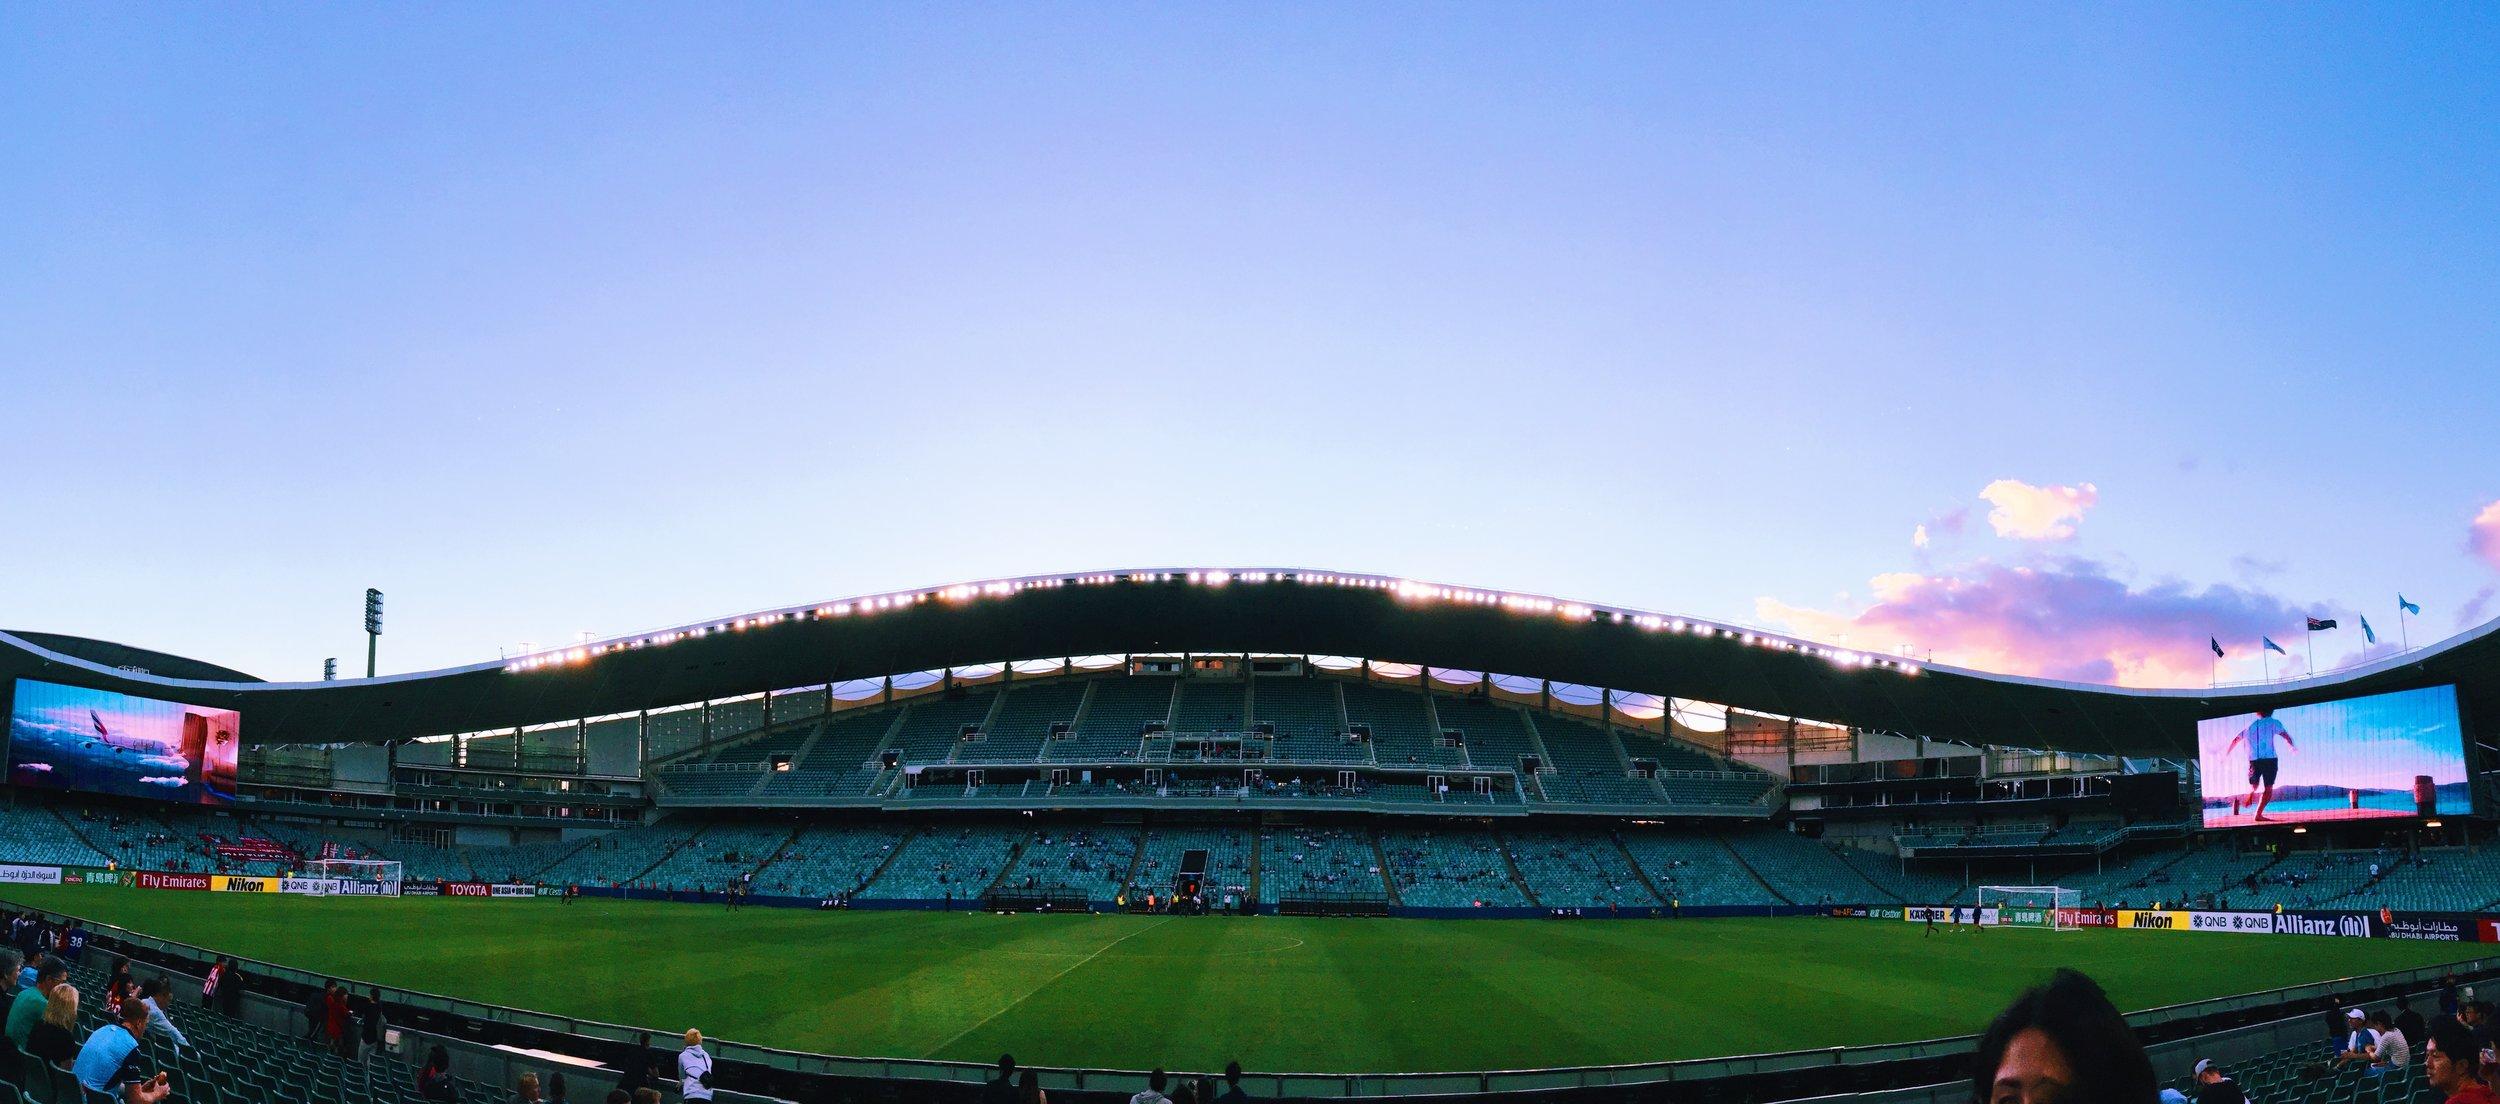 Allianz stadium, Sydney